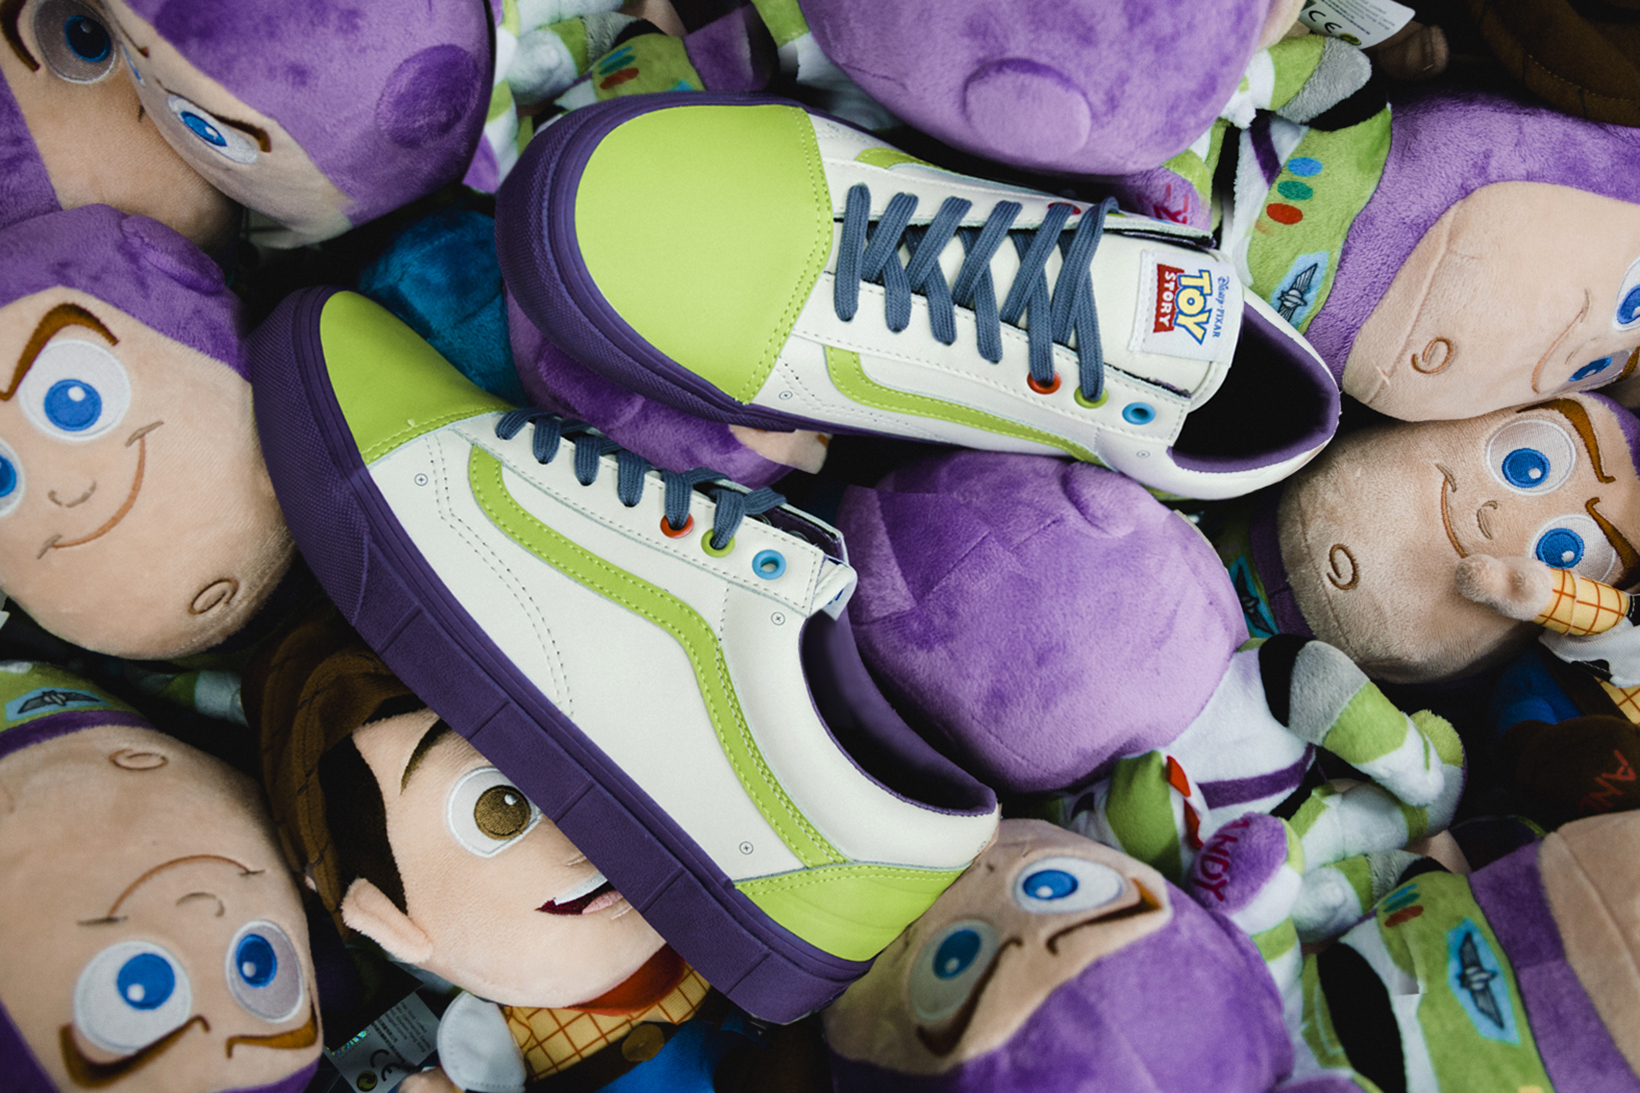 Toy Story Vans Sneakers Woody Buzz Lightyear Disney - 1765037